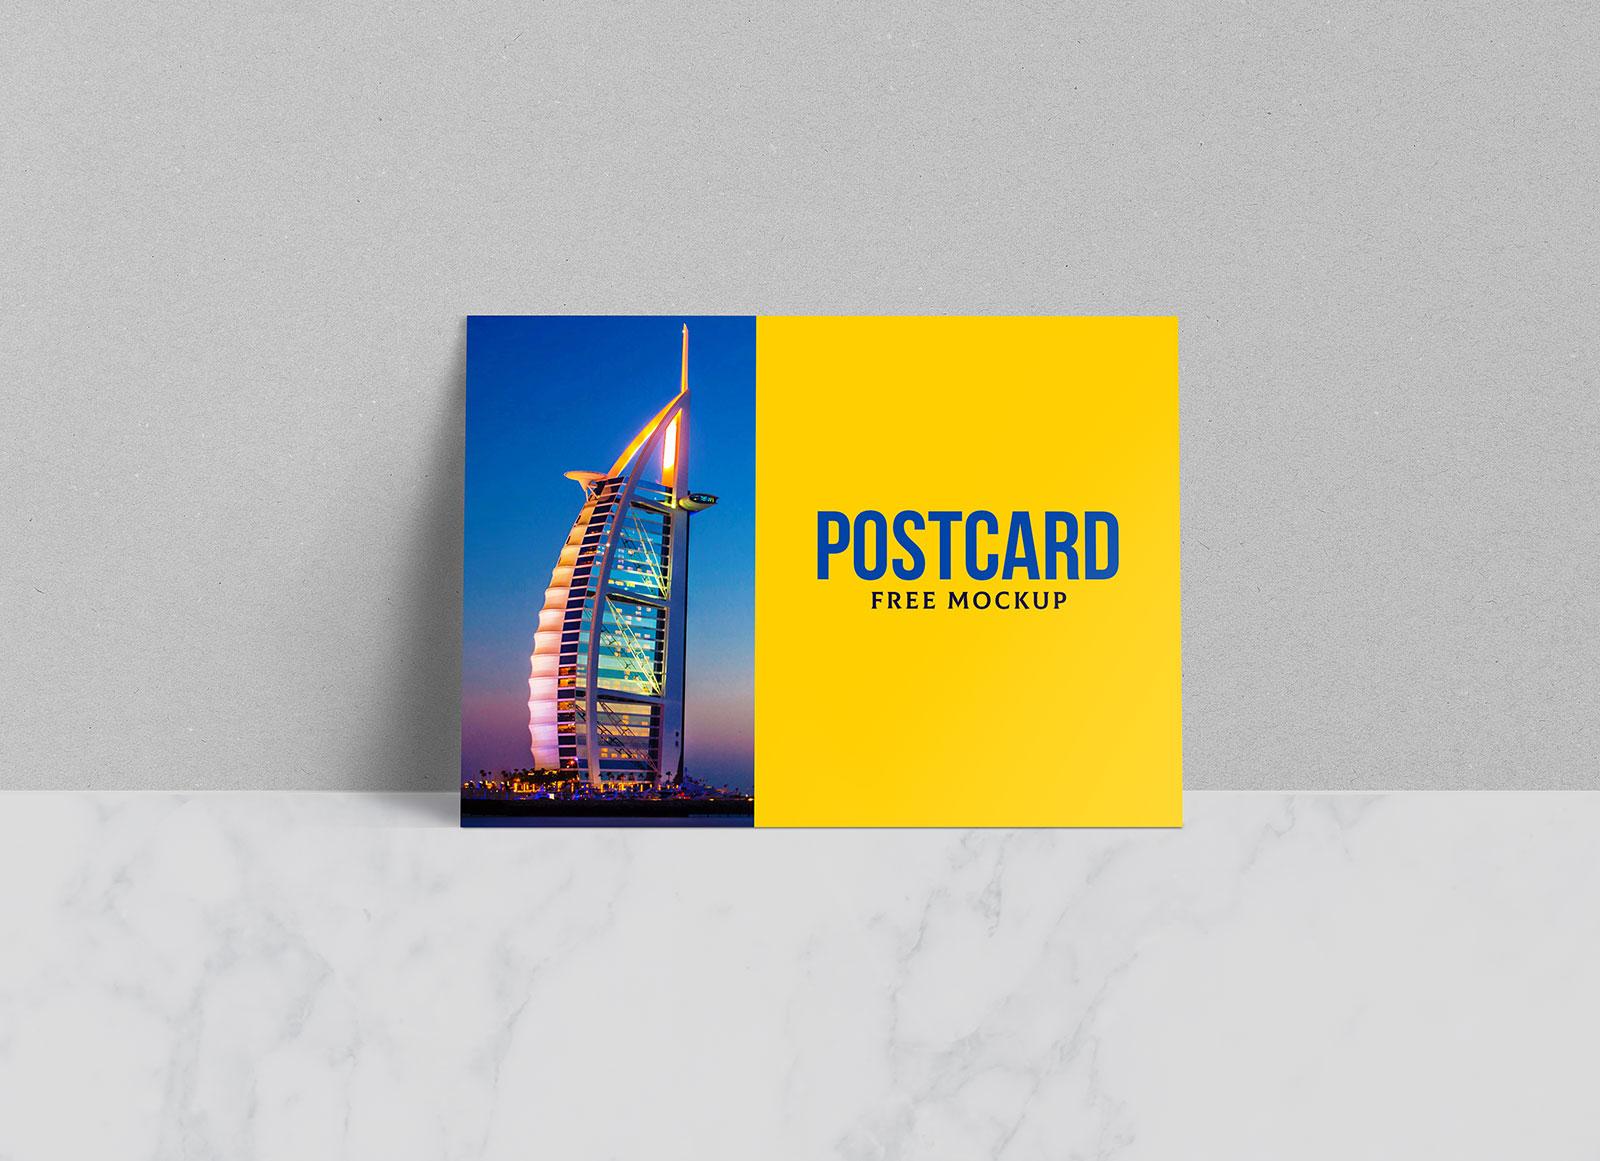 Free-Postcard-Greetings-Card-Mockup-PSD